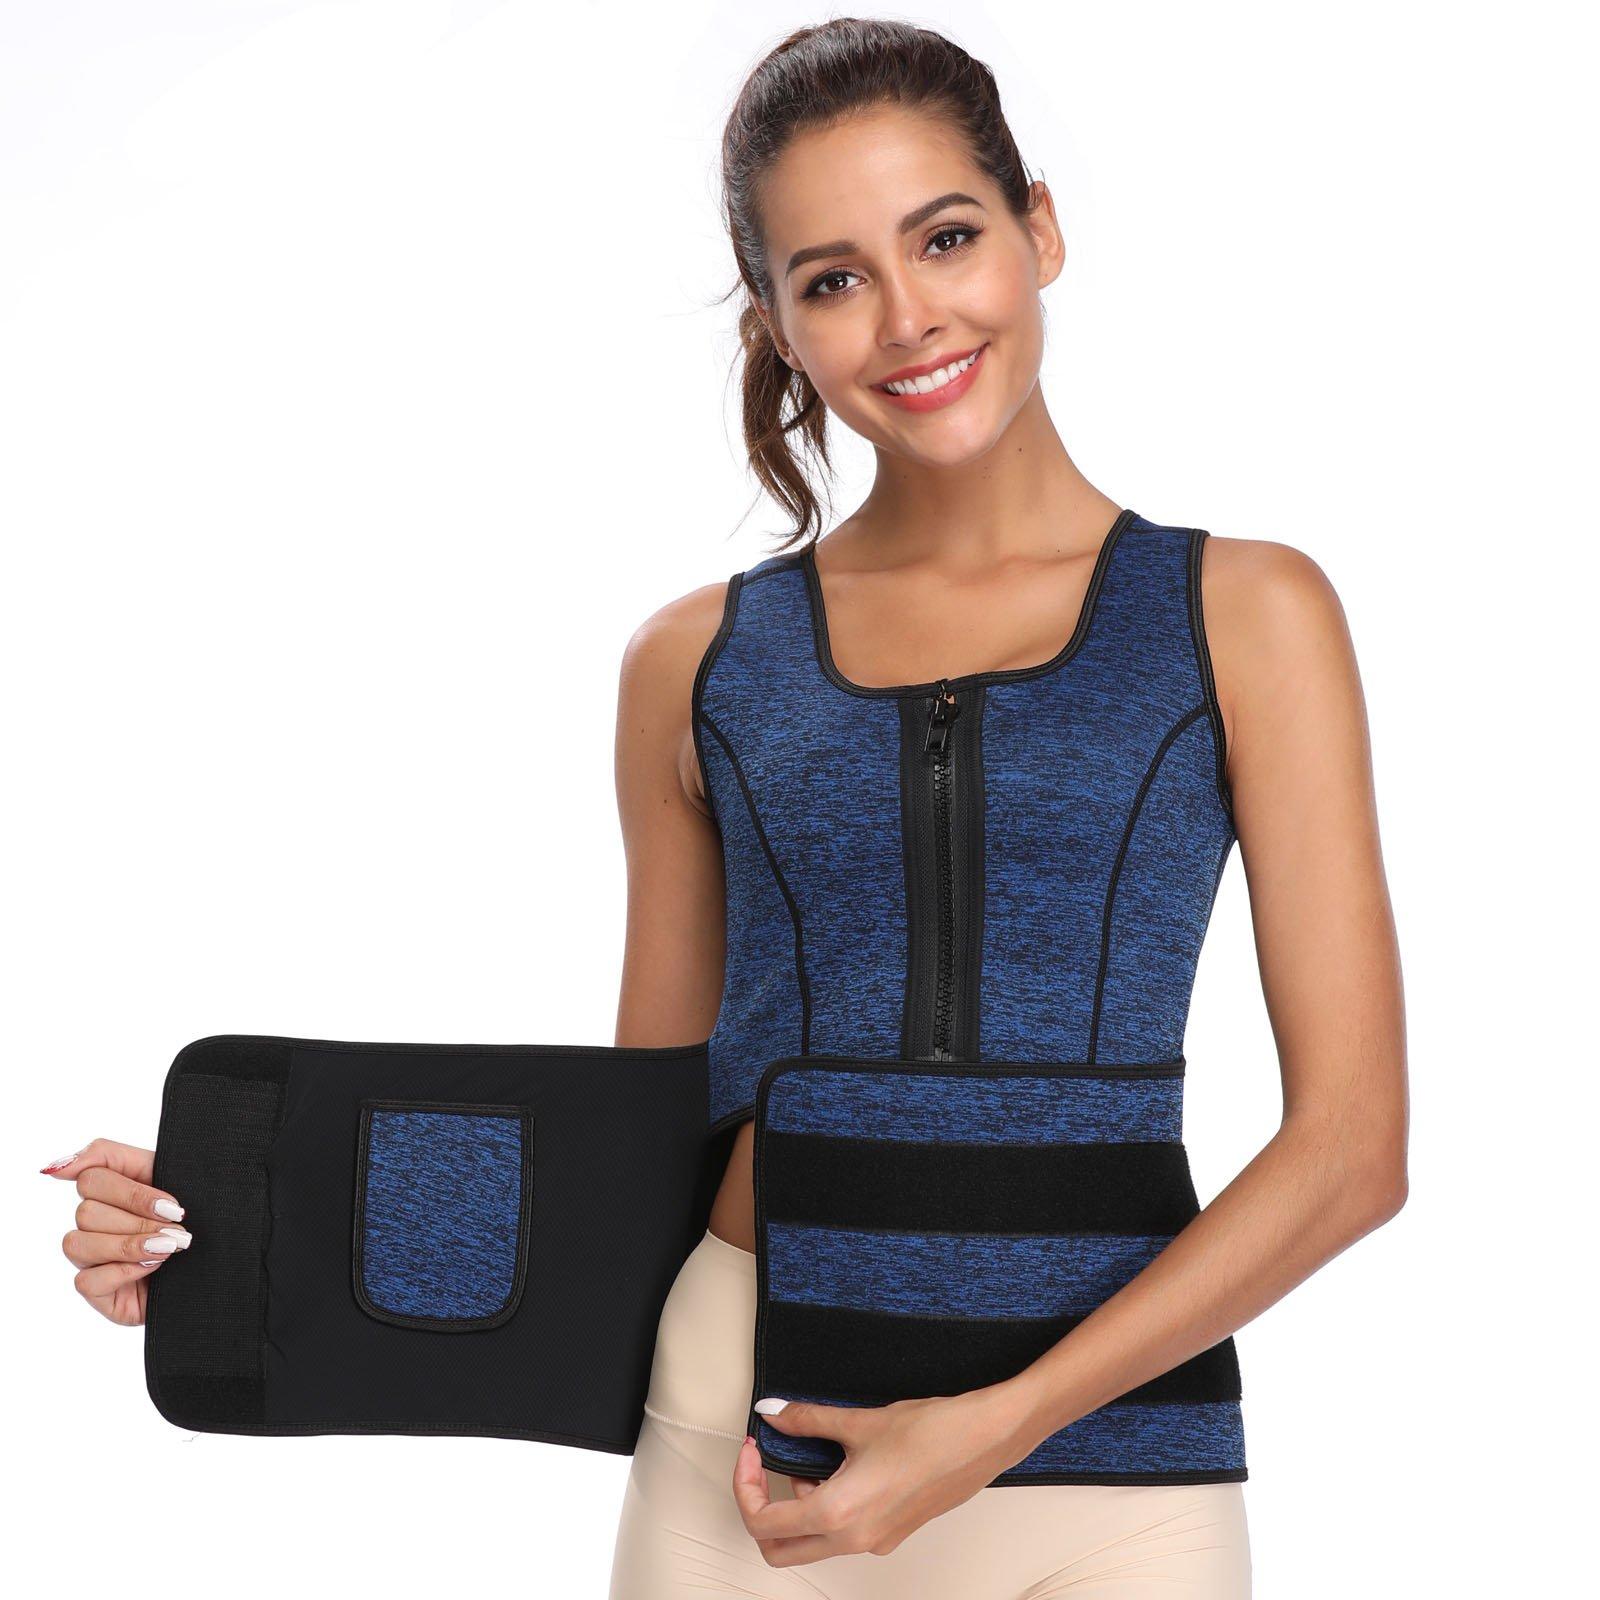 ebdda733c1e61 Galleon - Joyshaper Womens Neoprene Sauna Suit Waist Trainer Vest For  Weight Loss With Sweat Trimmer Belt Tank Top